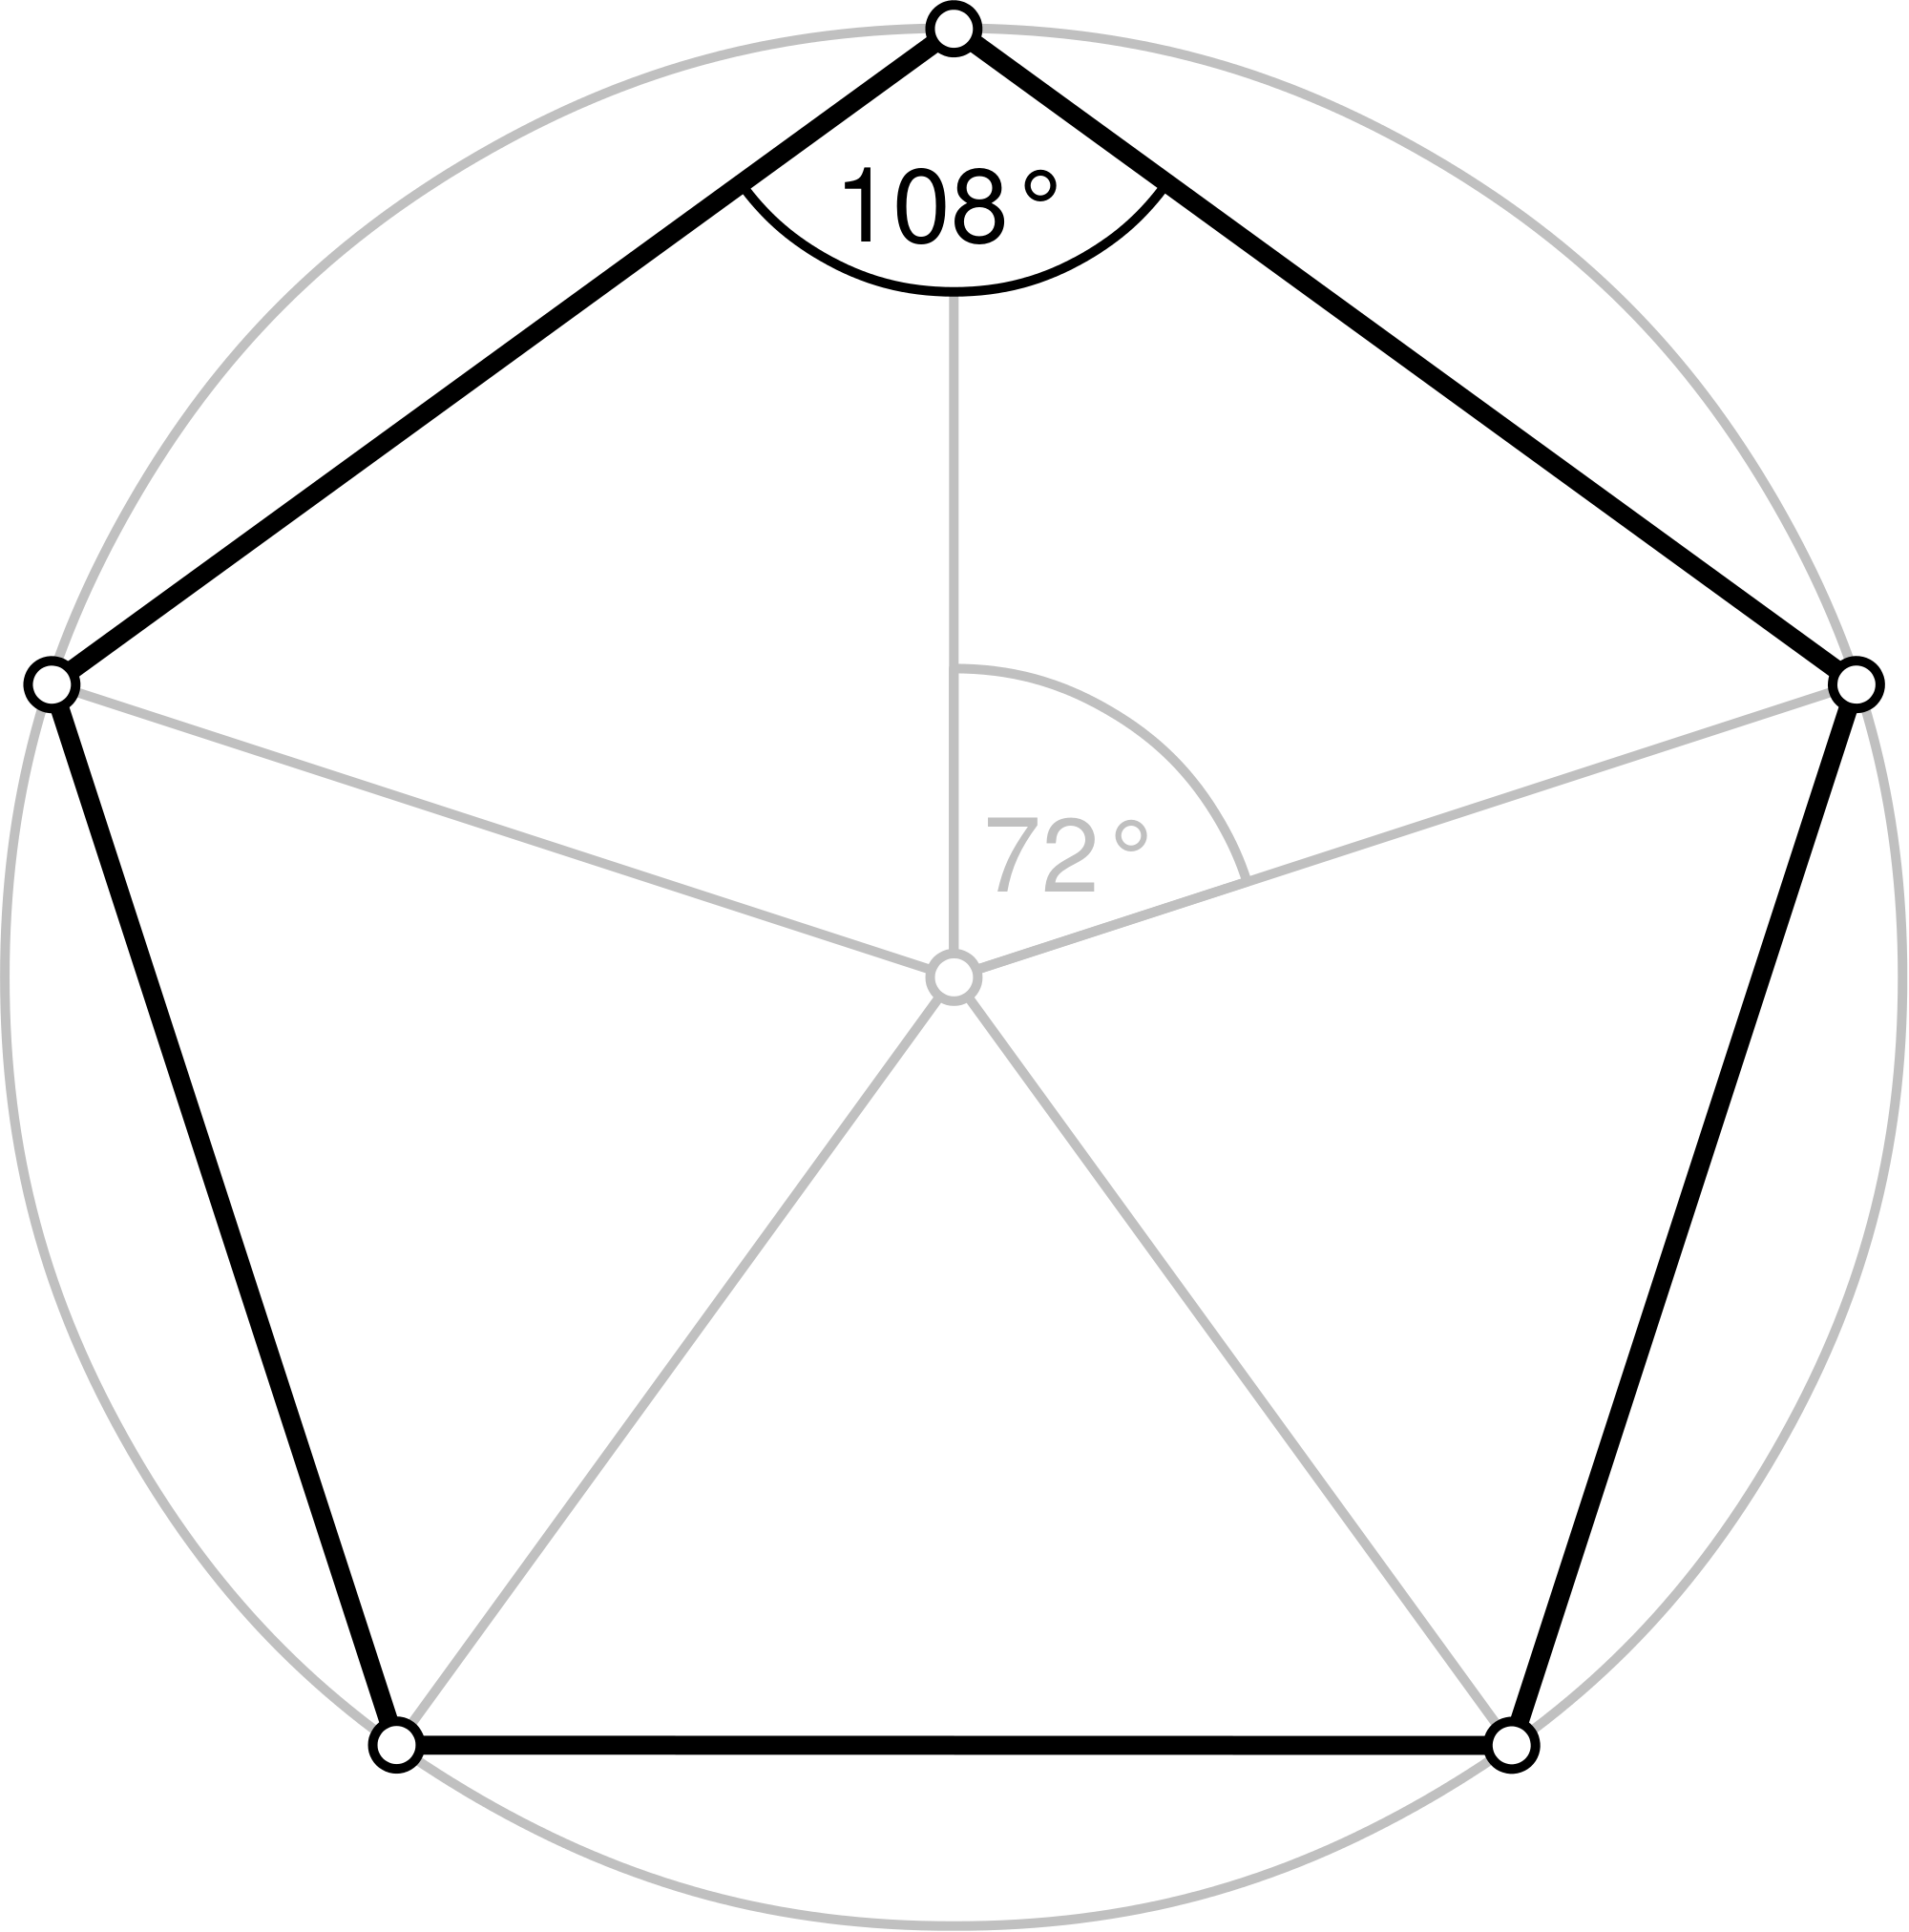 Pentagram With 72 Degree Segments